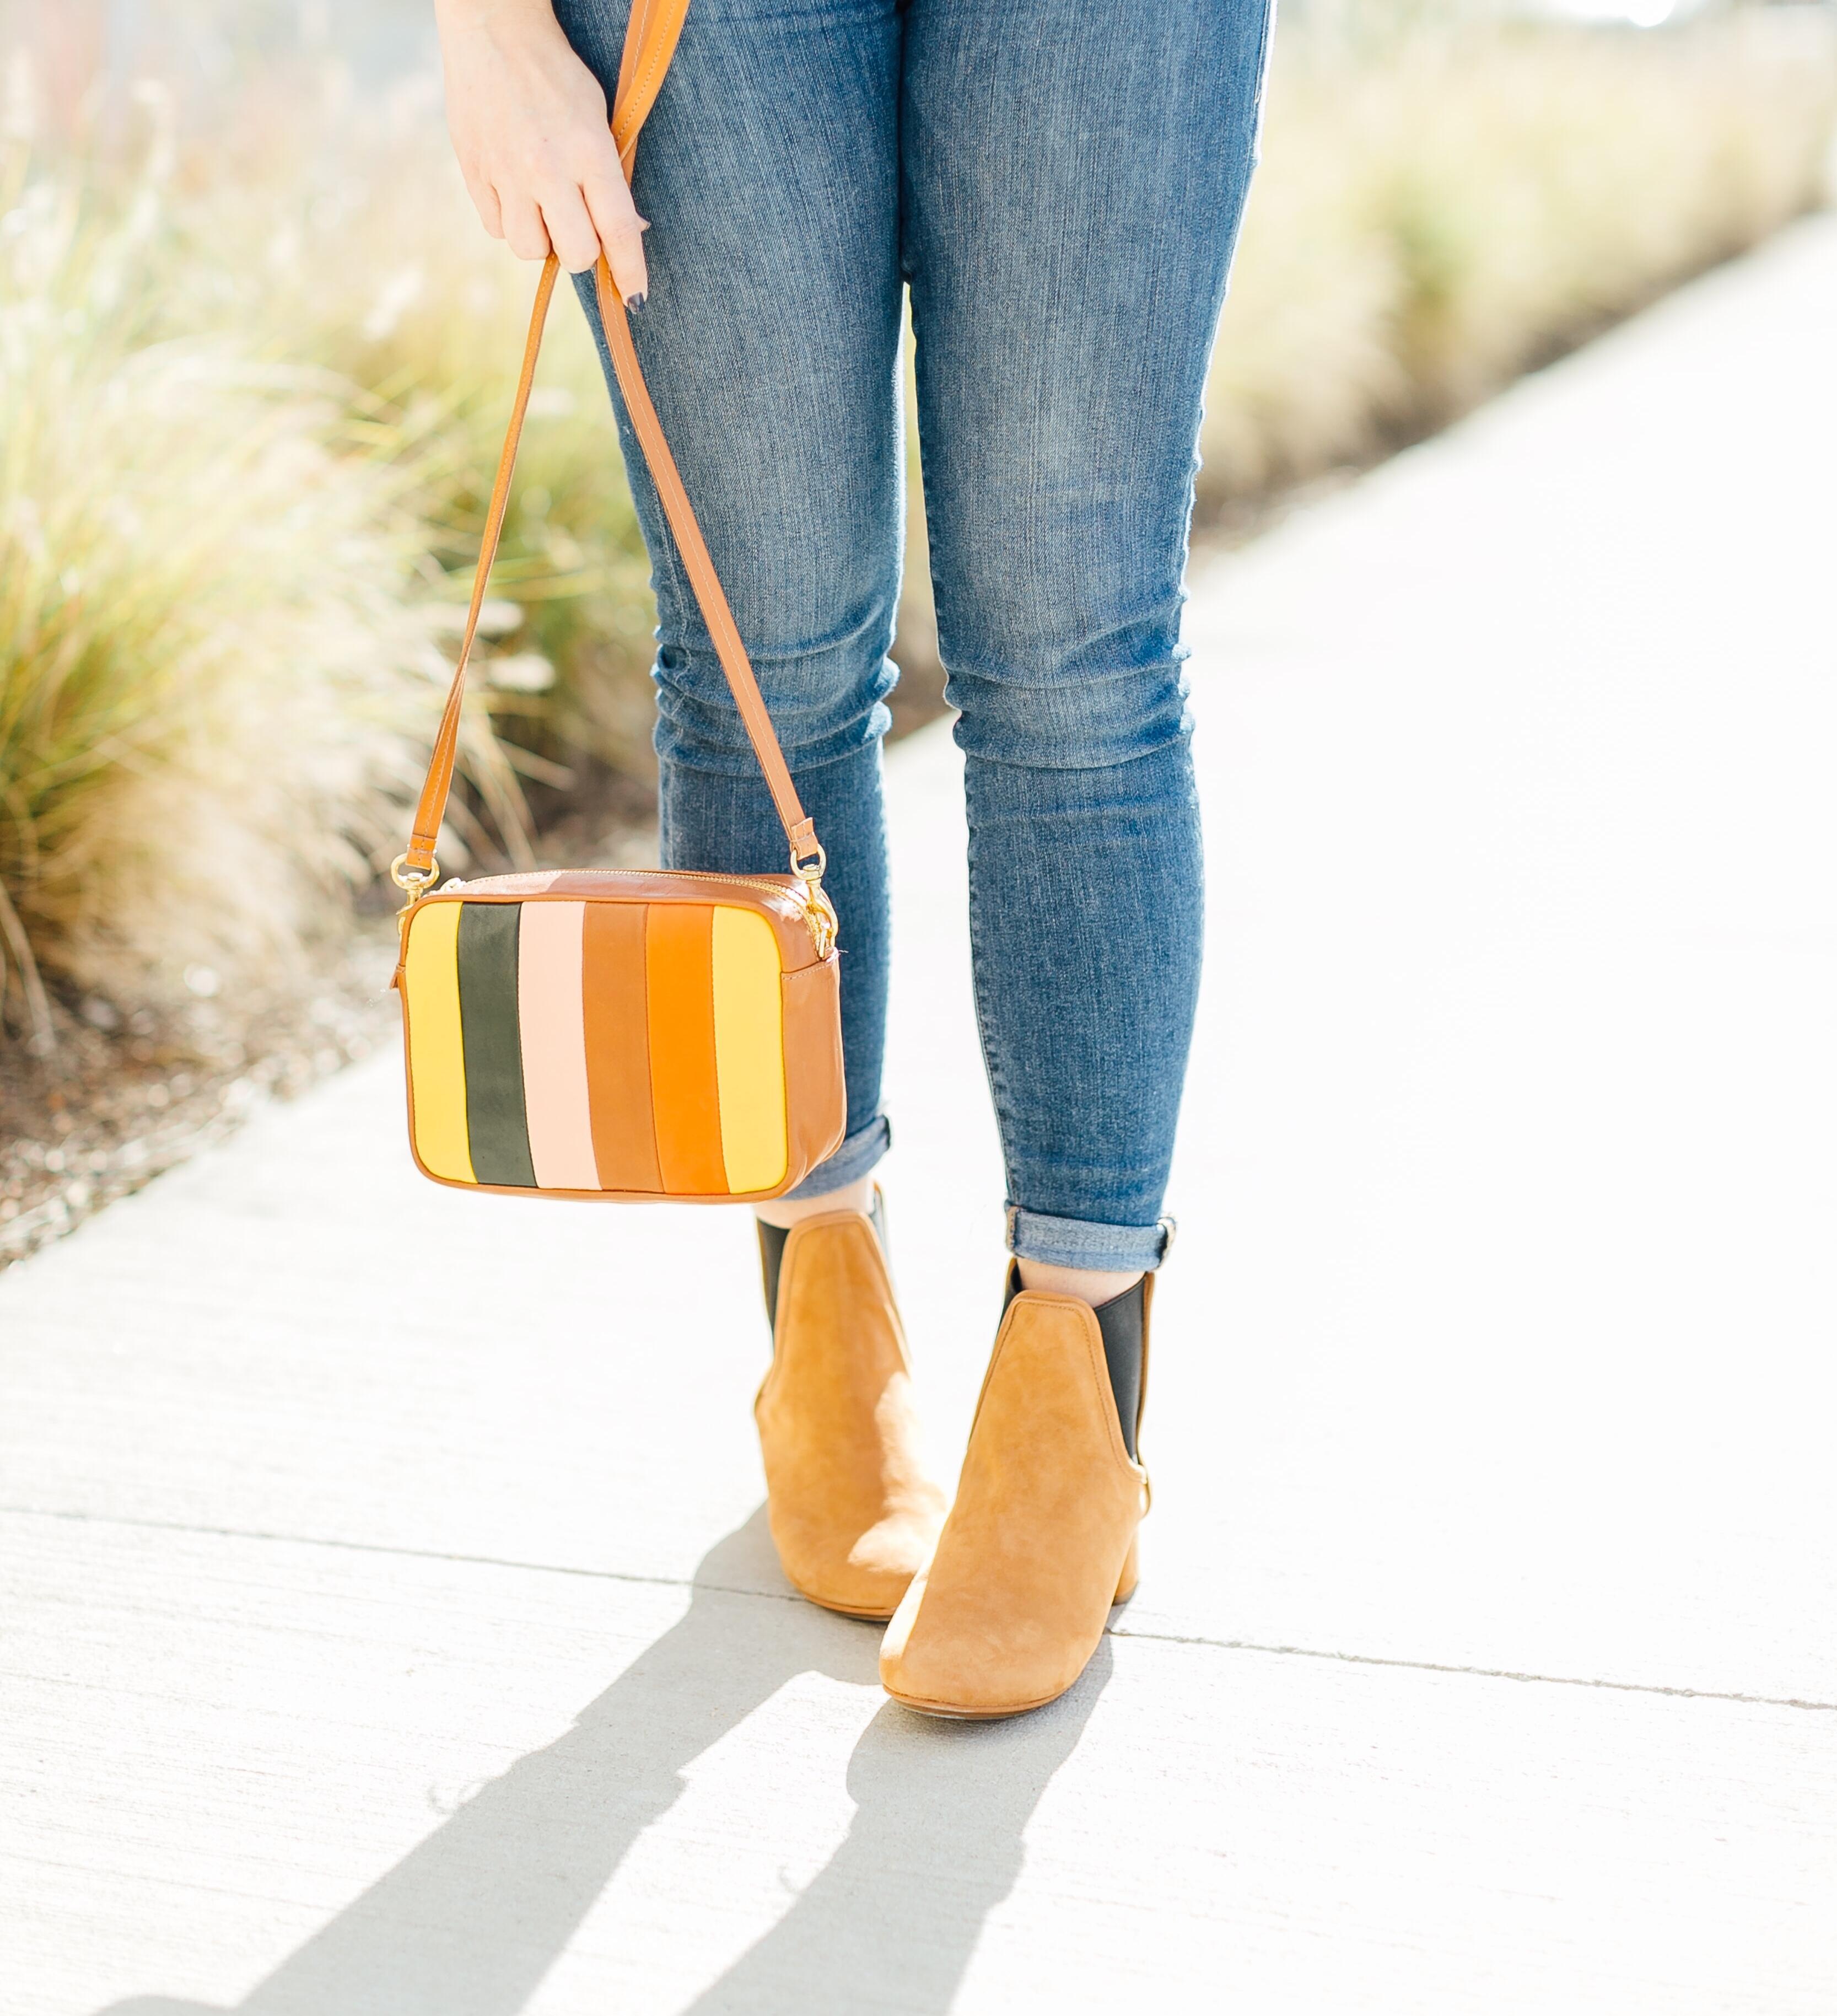 East Memphis style blogger Walking in Memphis in High Heels